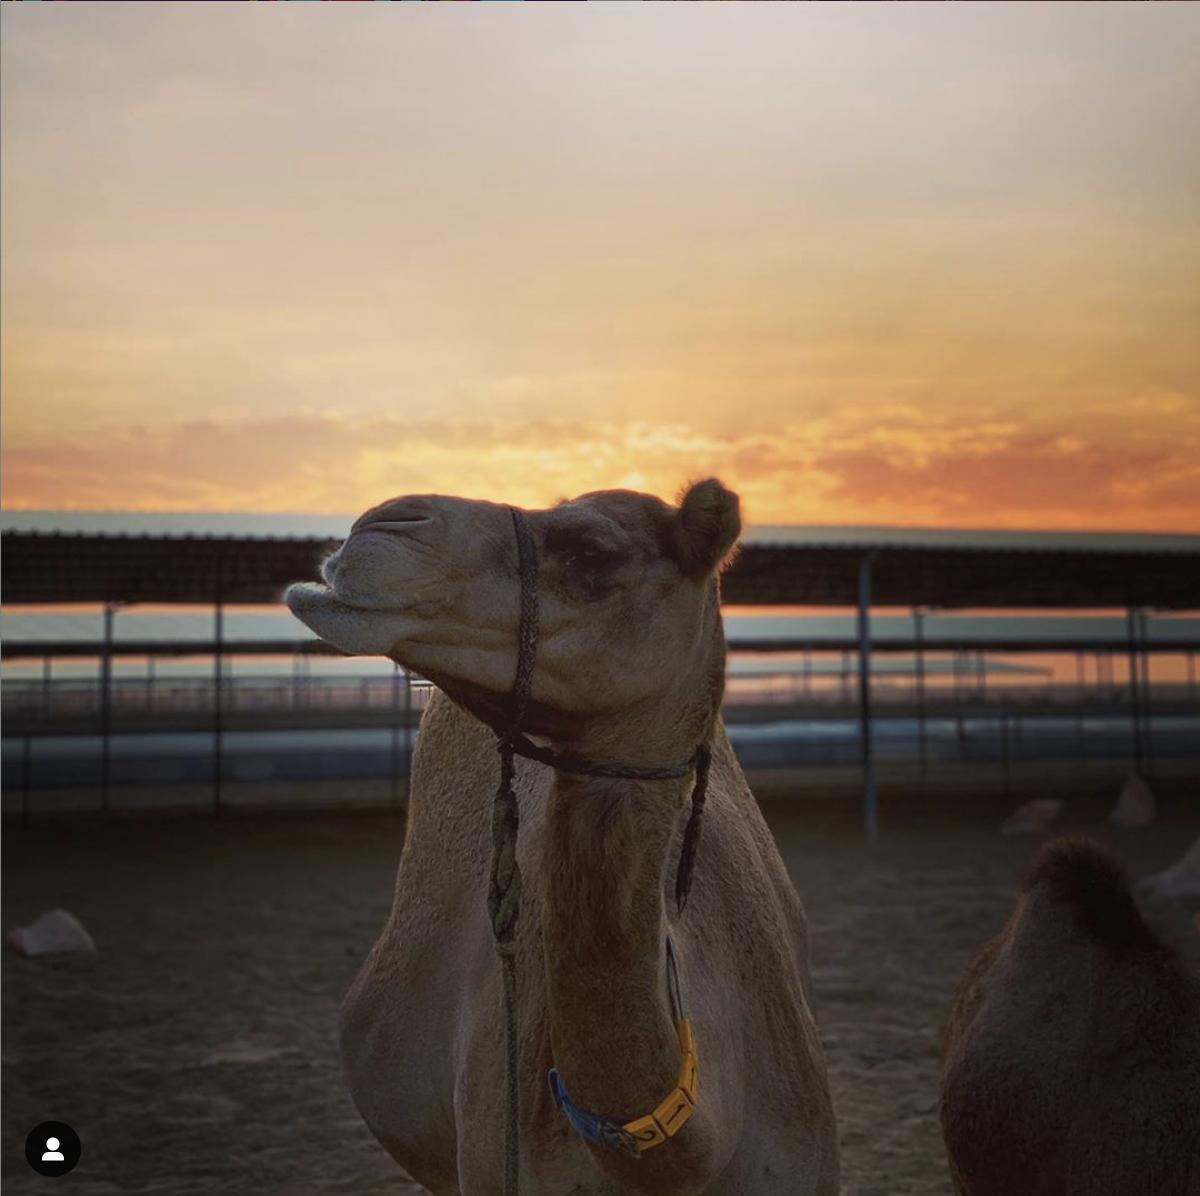 Visiting Camel Farm and feeding camels